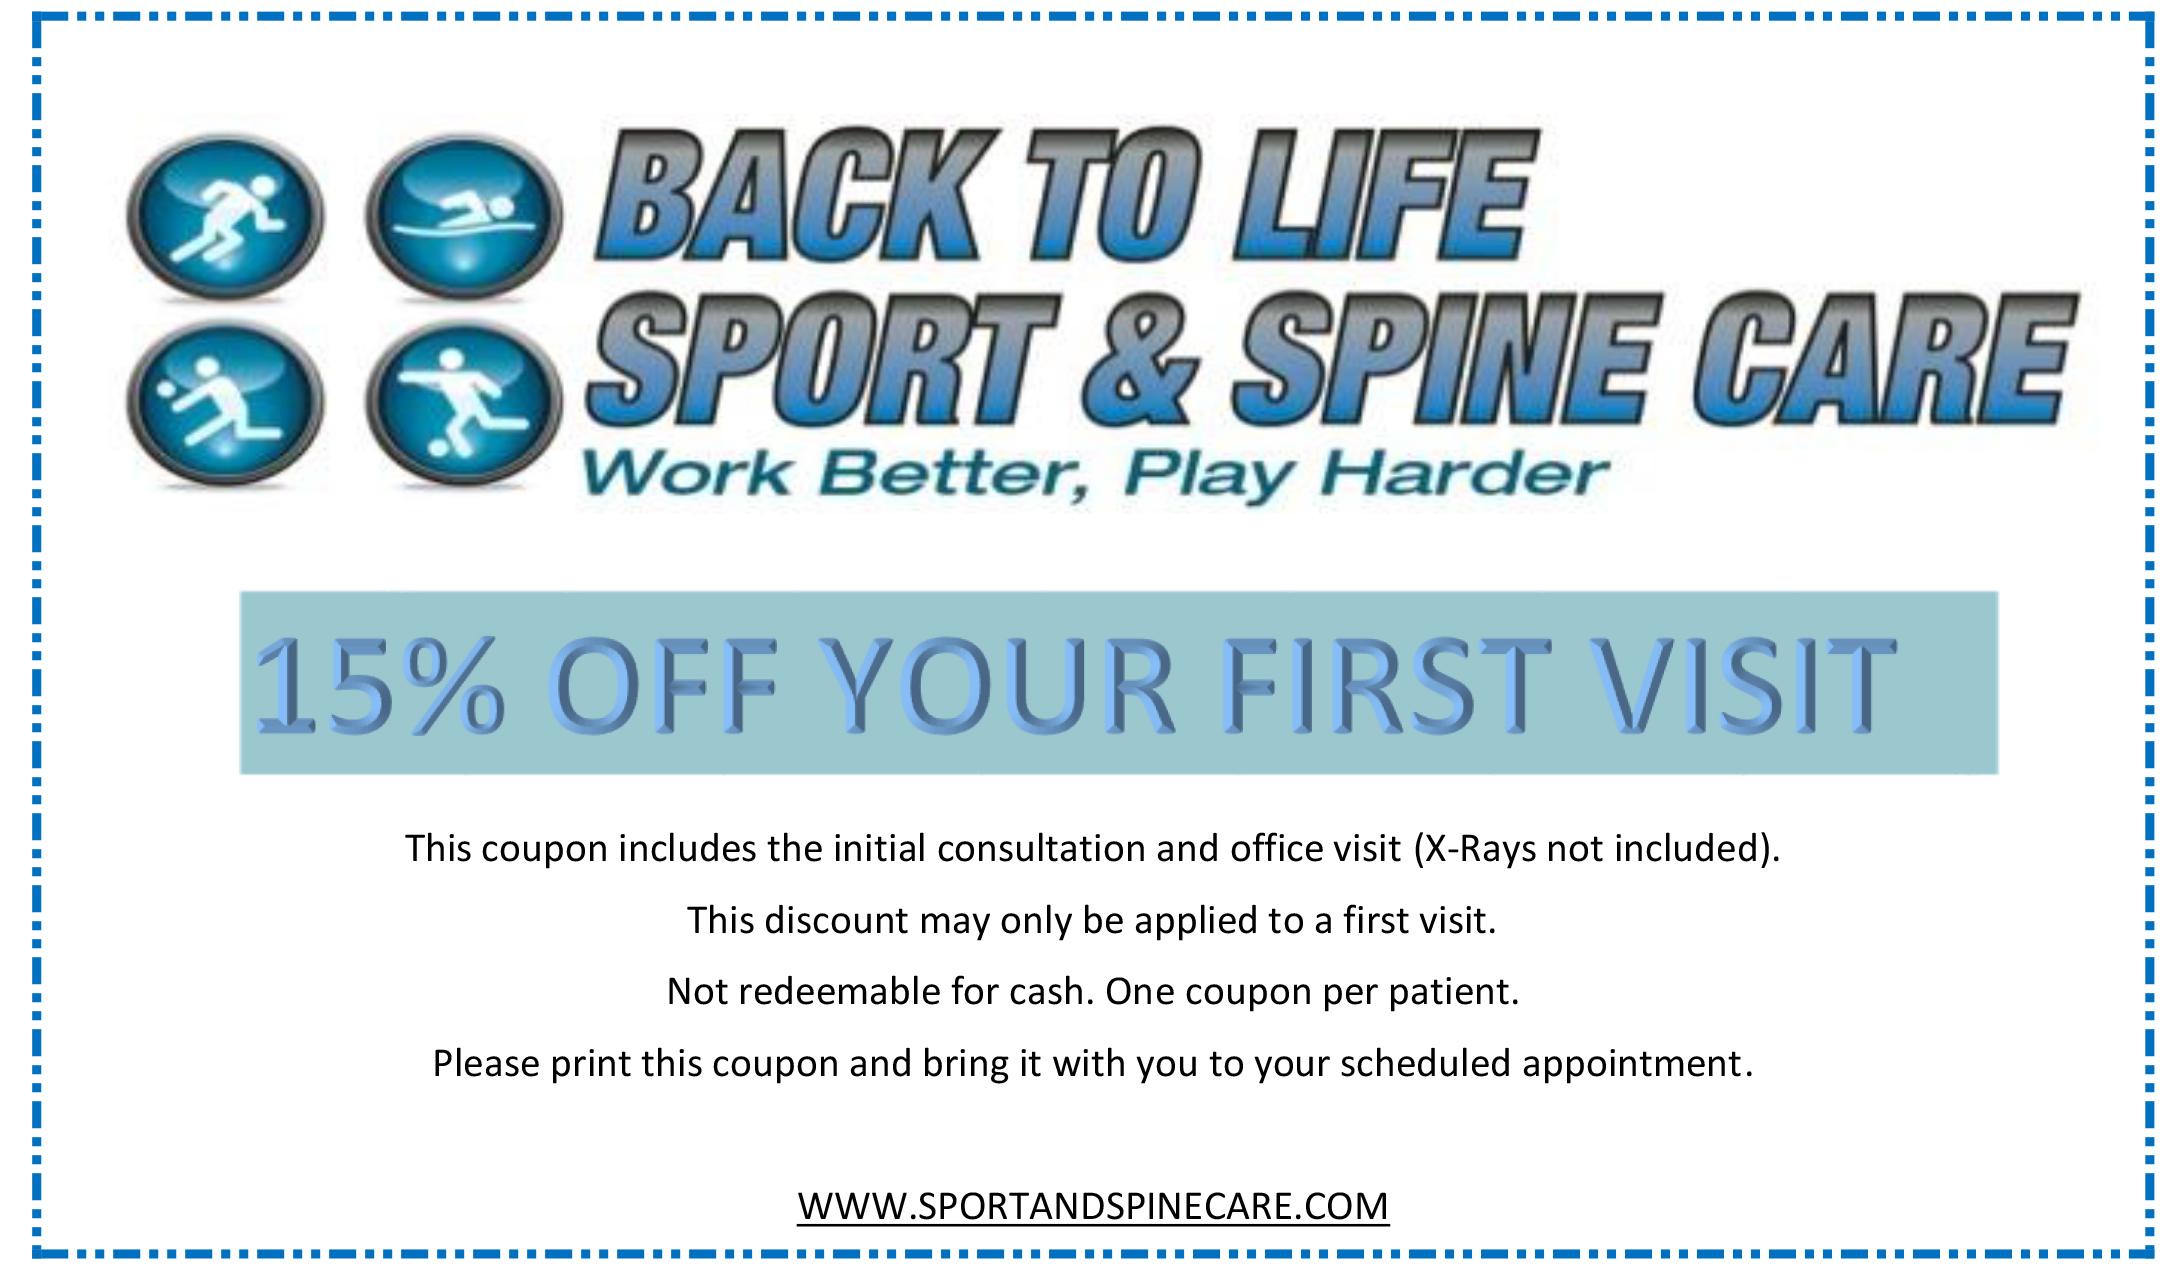 btl-coupon.jpg